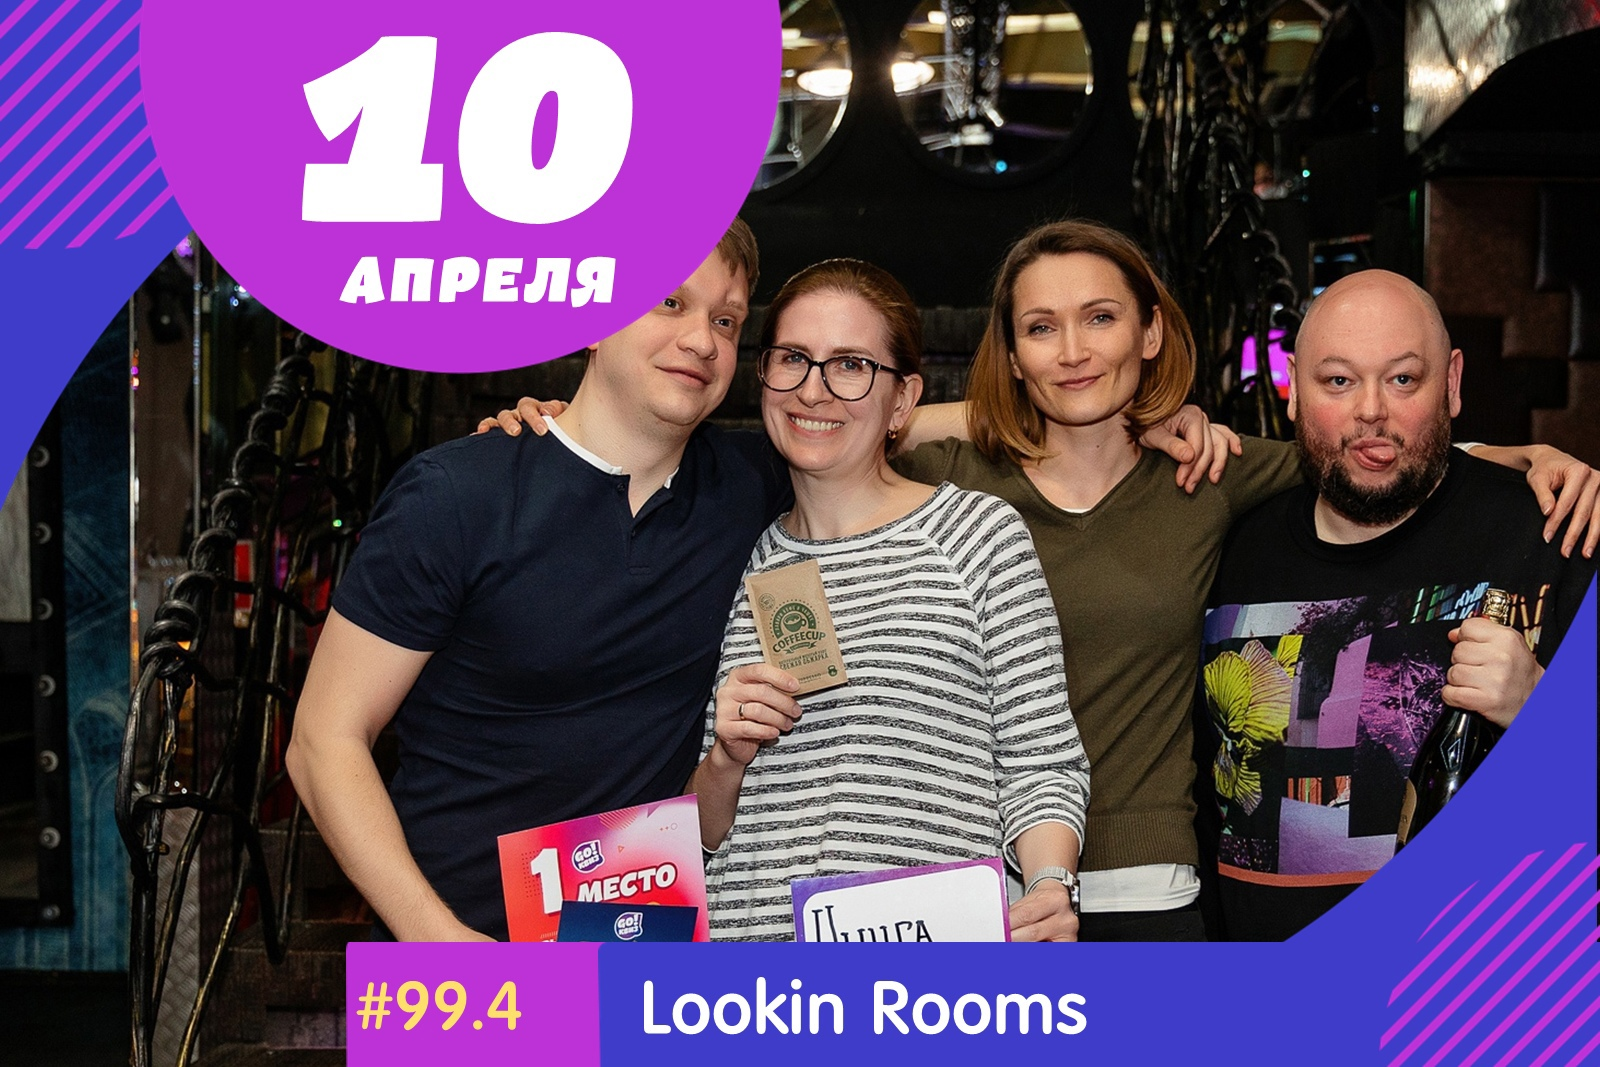 GO!Квиз №99.4, 10 апреля, Lookin Rooms (140 фото)